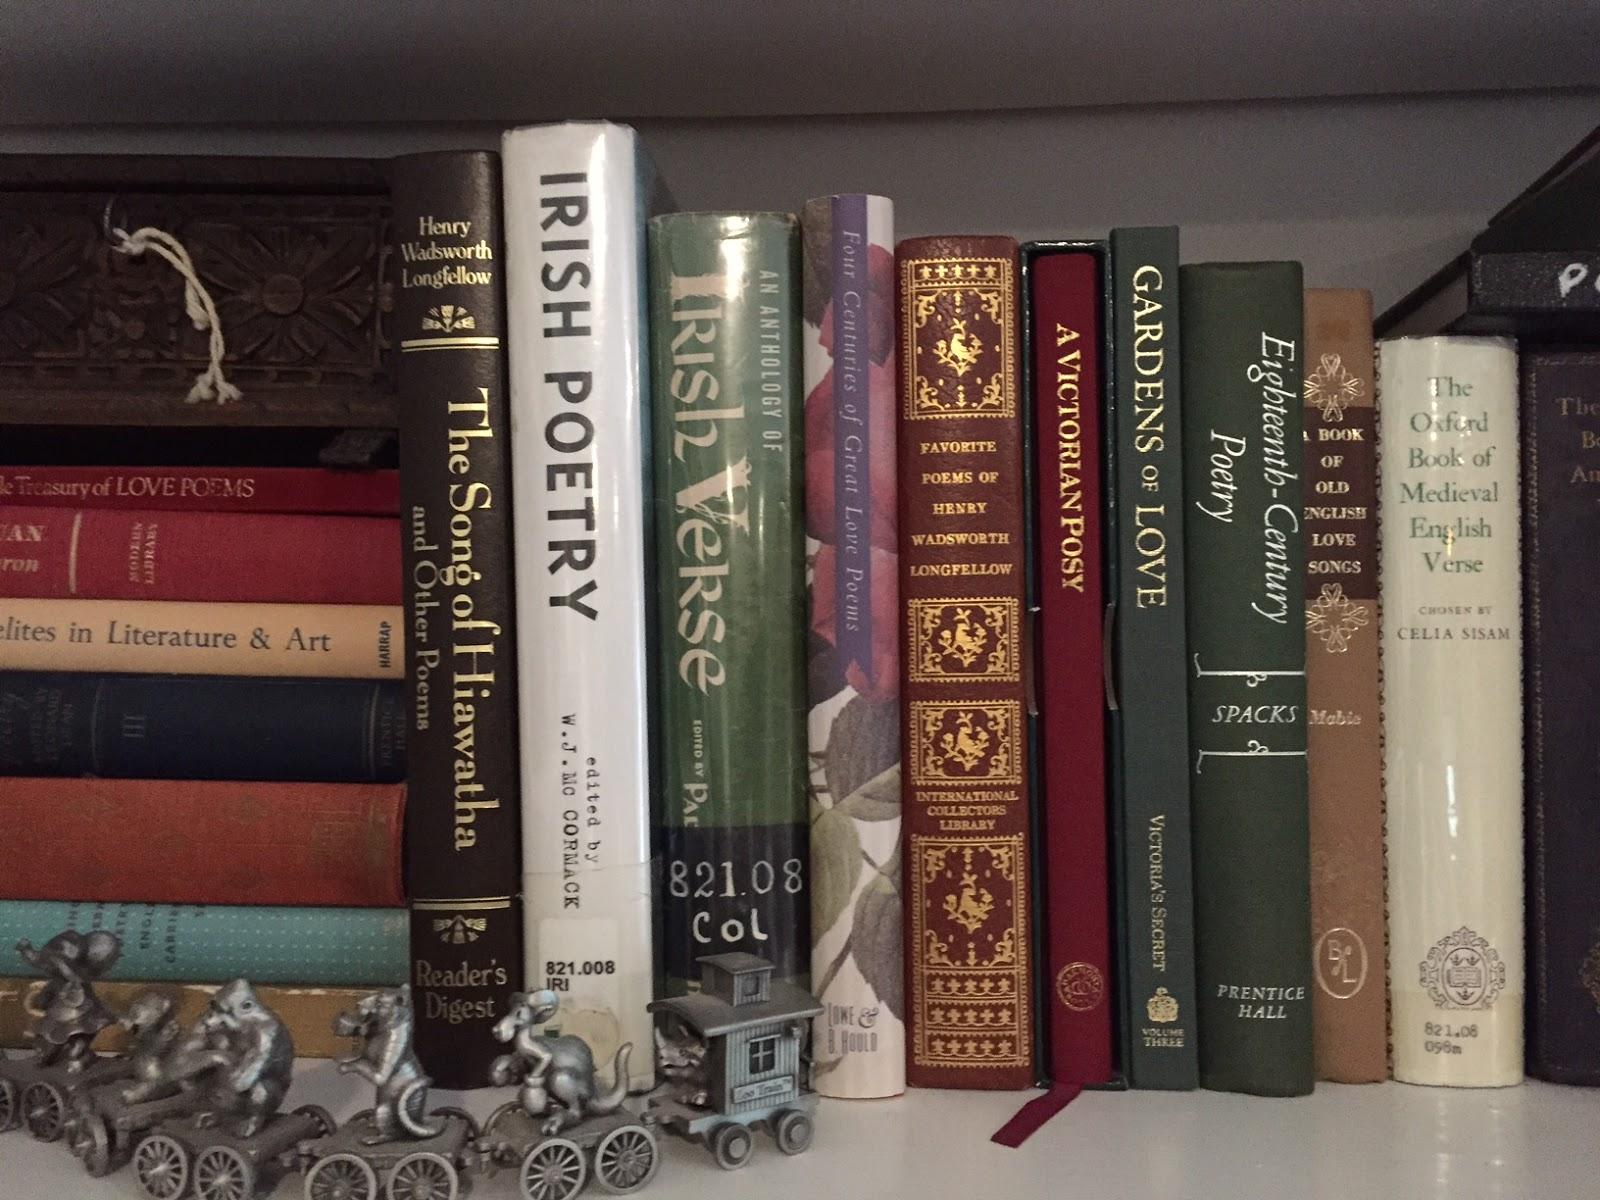 Shelf The bottom